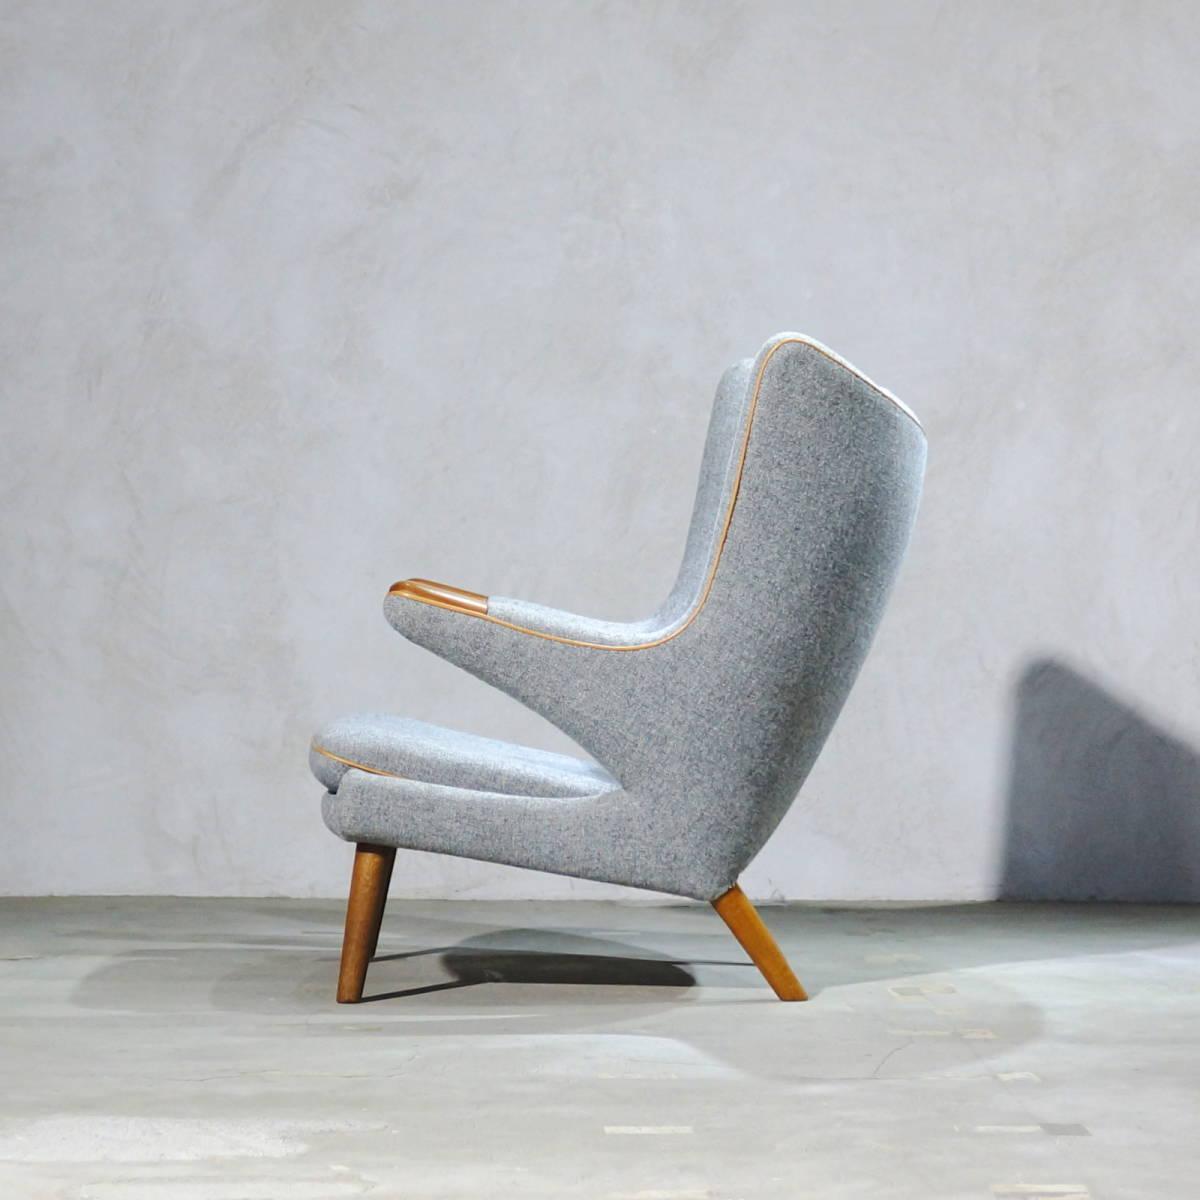 Hans J. Wegner ウェグナー AP-19 Bear Chair ベアチェア Teak & Oak チークオーク ※フィンユール モーエンセン_画像3